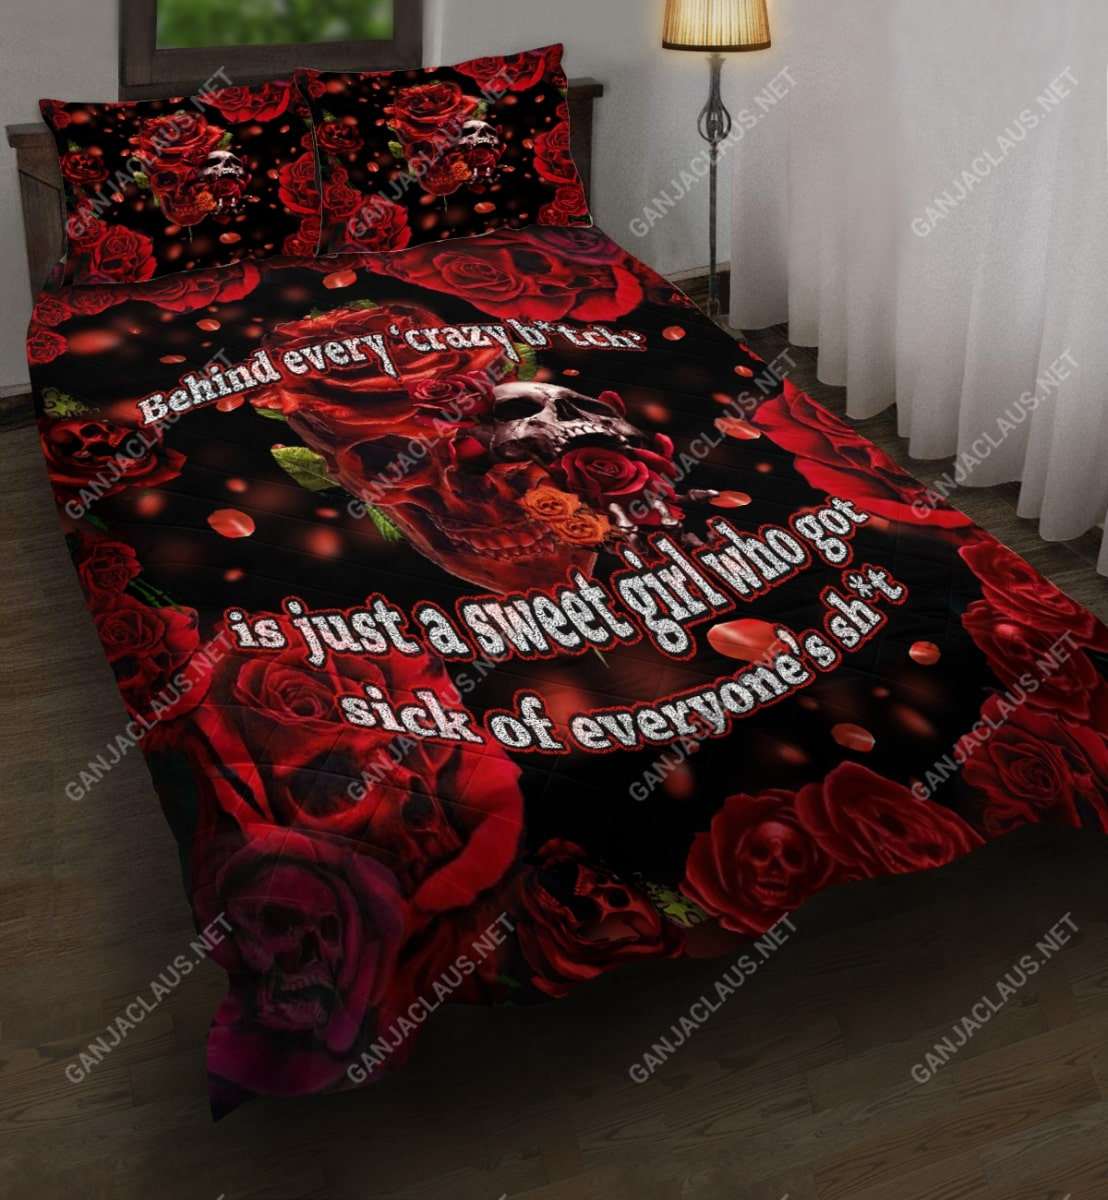 behind every crazy skull roses full printing bedding set 4